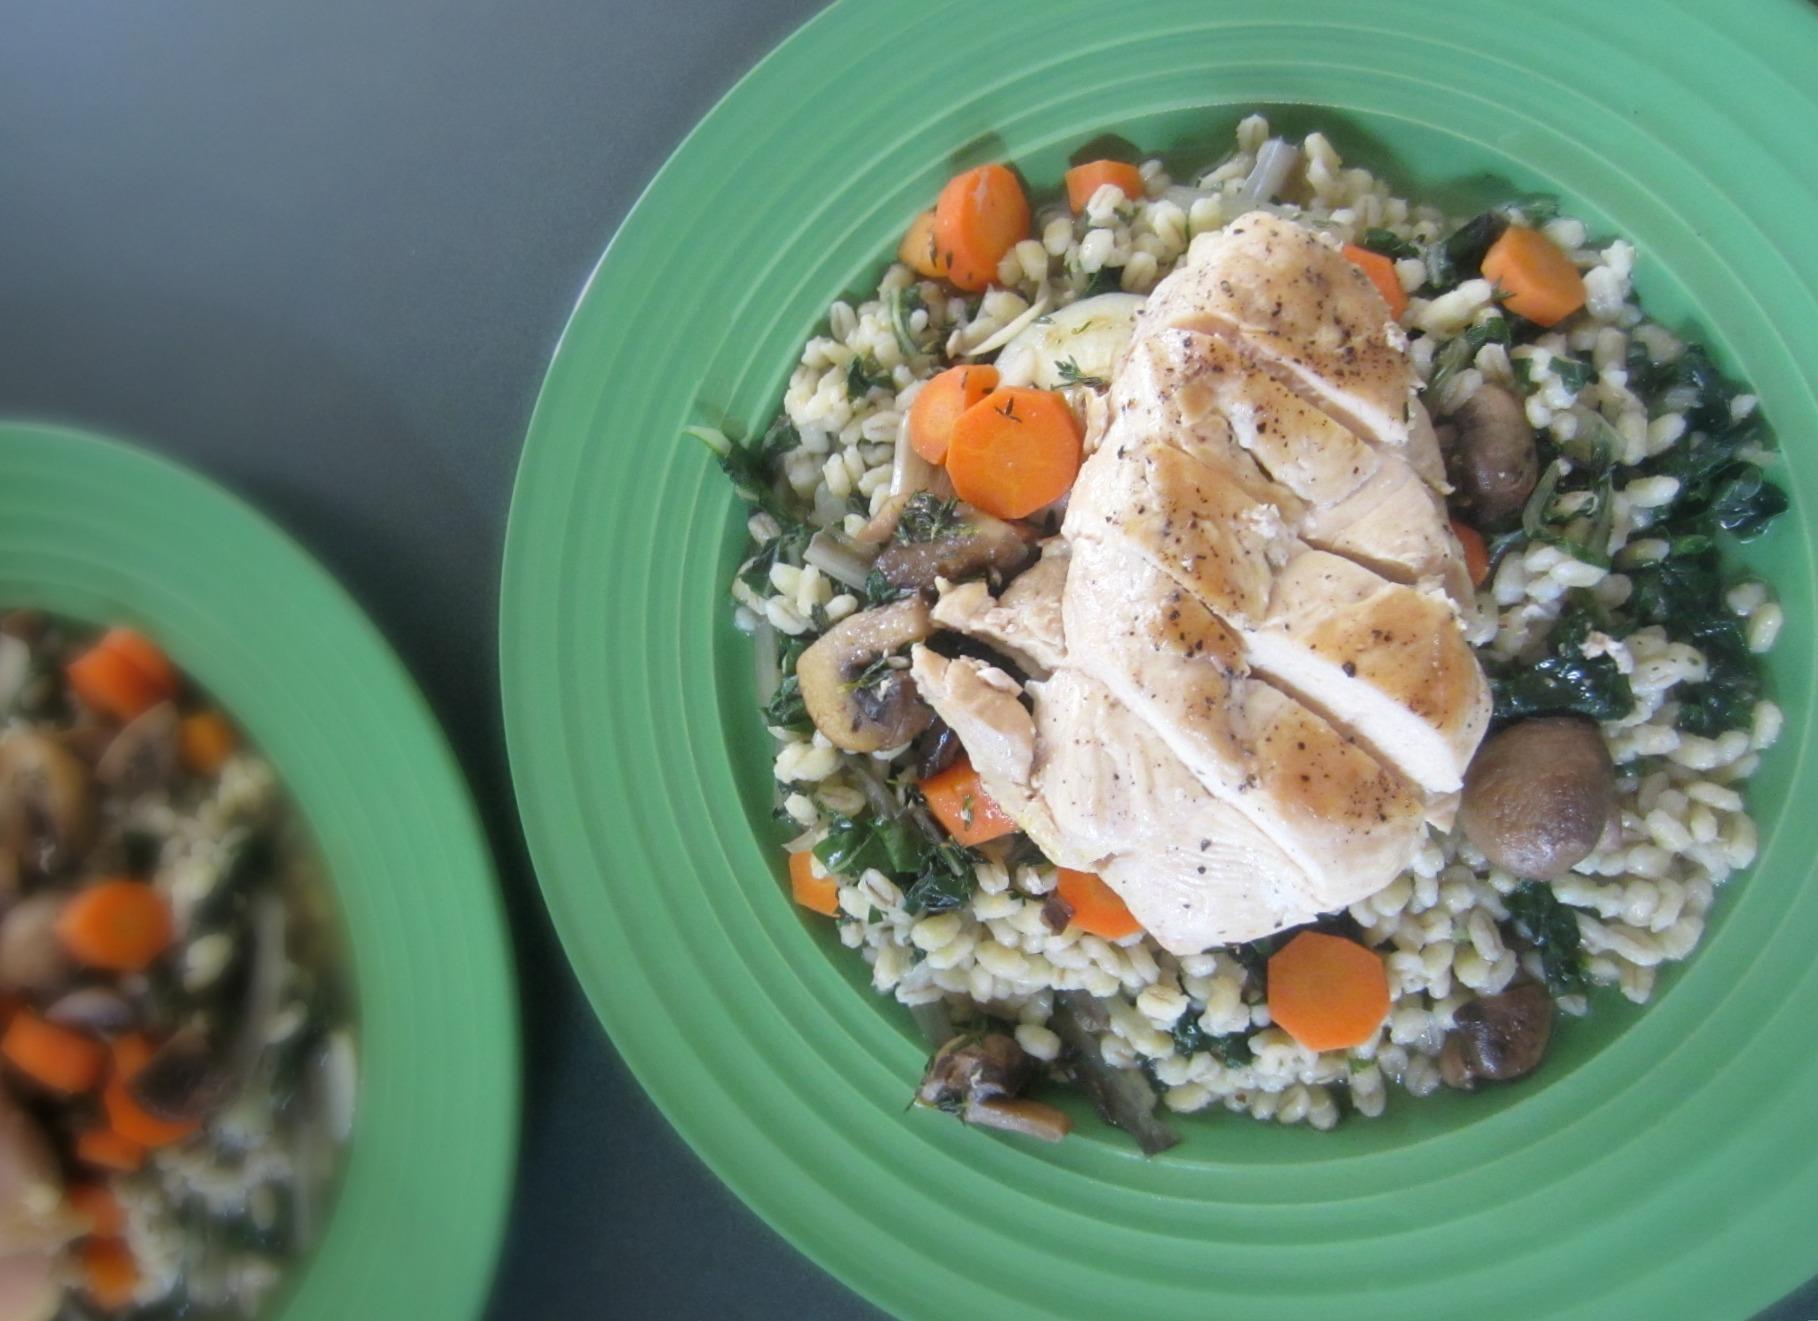 Pan-Seared Chicken Verjus Blue Apron Meal 3